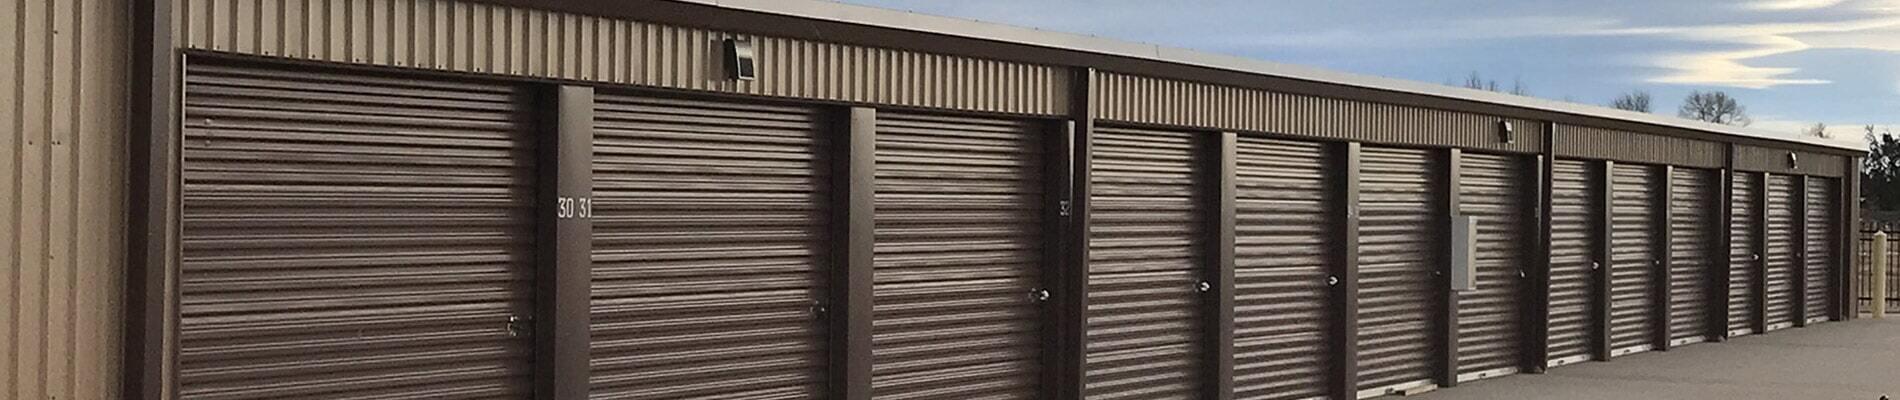 outdoor storage units in Laramie, WY